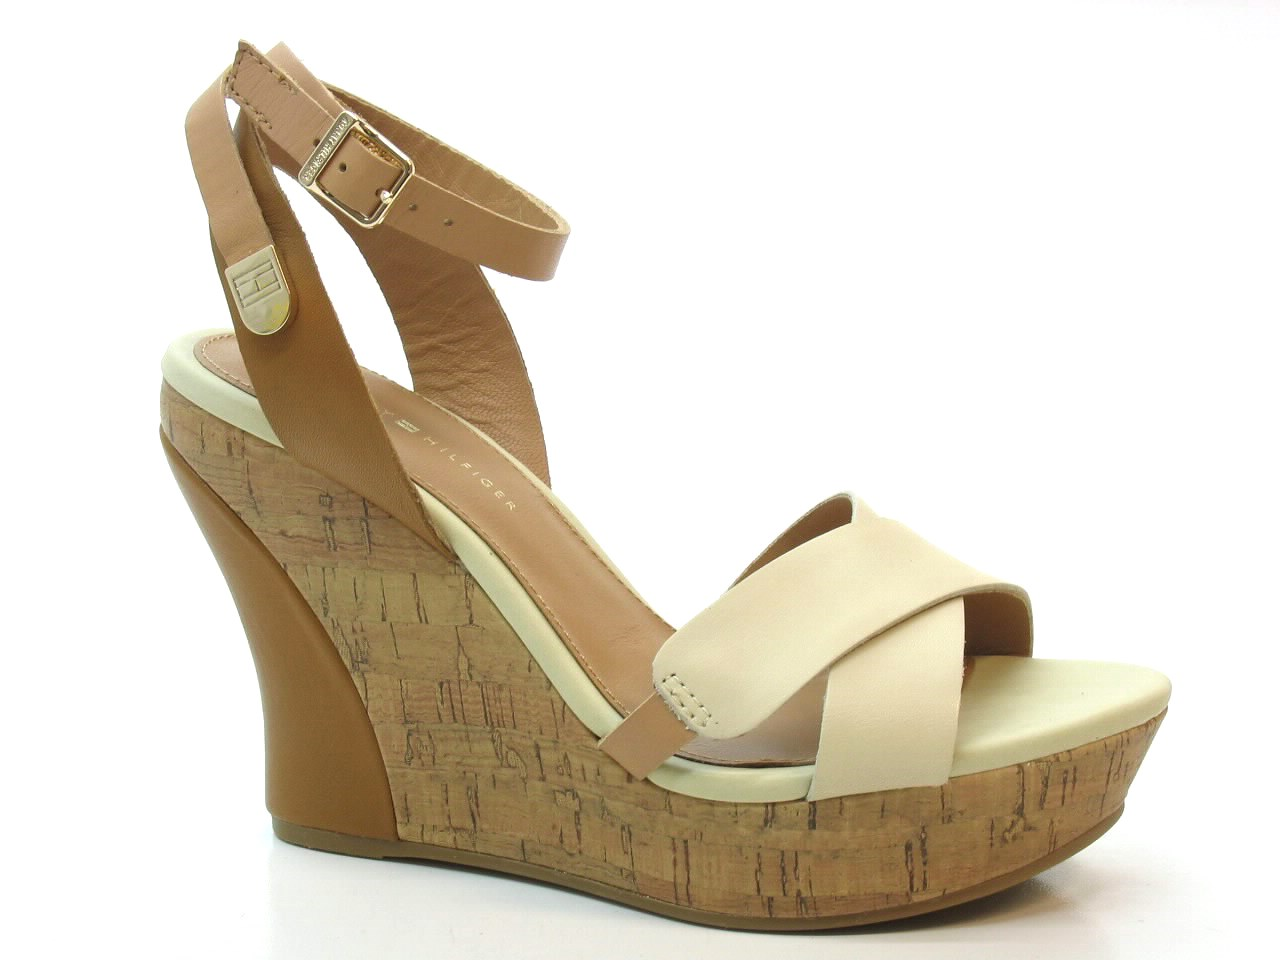 Wedge Sandals Tommy Hilfiger - 309 16785